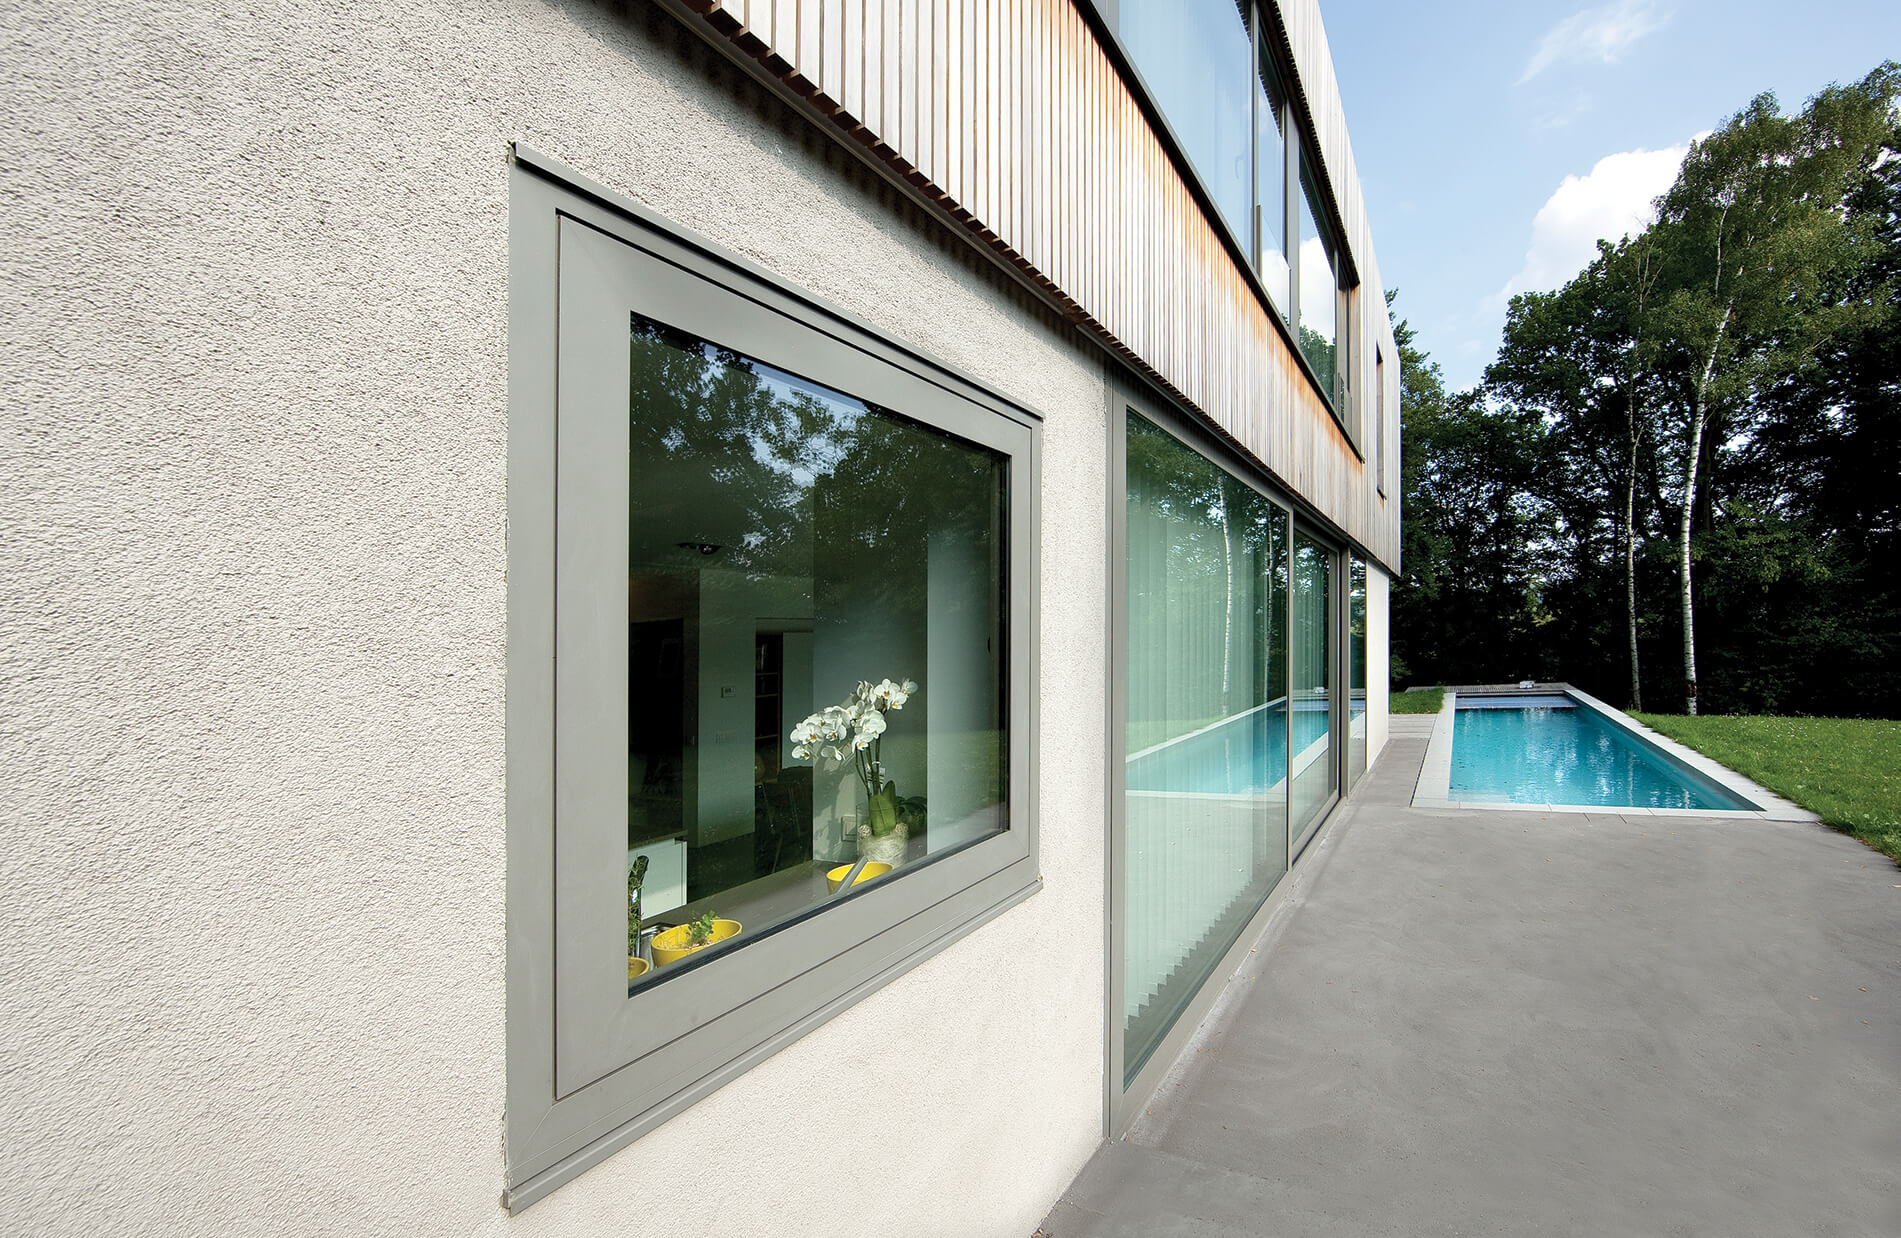 Aluminium windows using the Raynaers CS 77 profile.